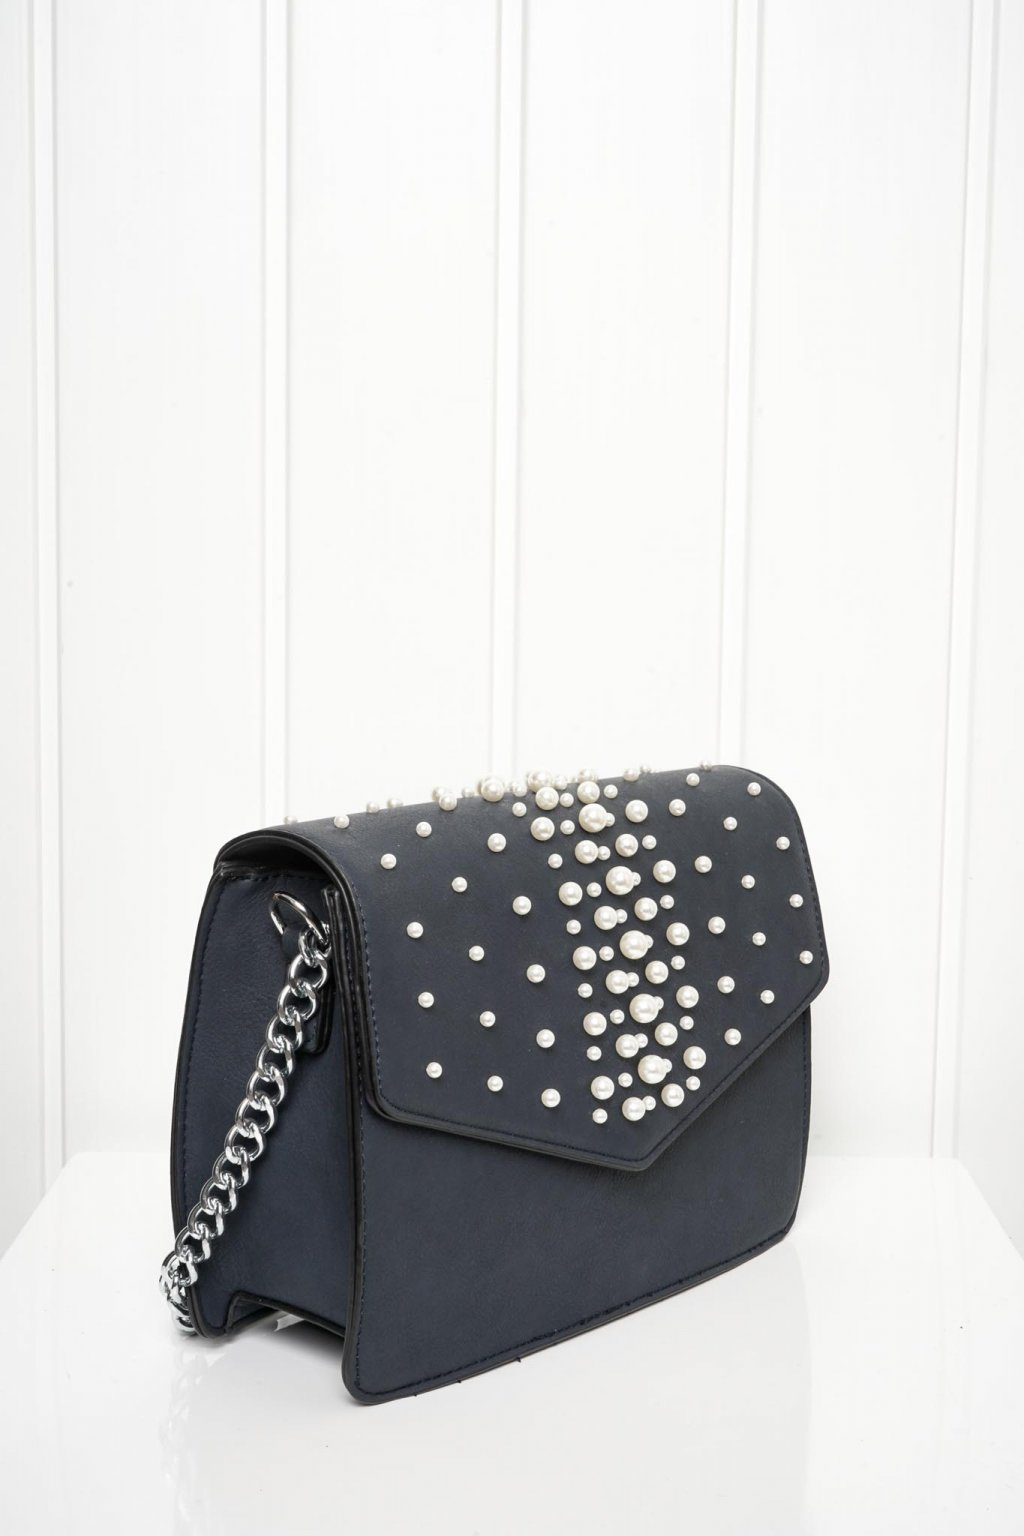 Kabelka, crossbody, ruksak, shopping bag, shopperka, 377